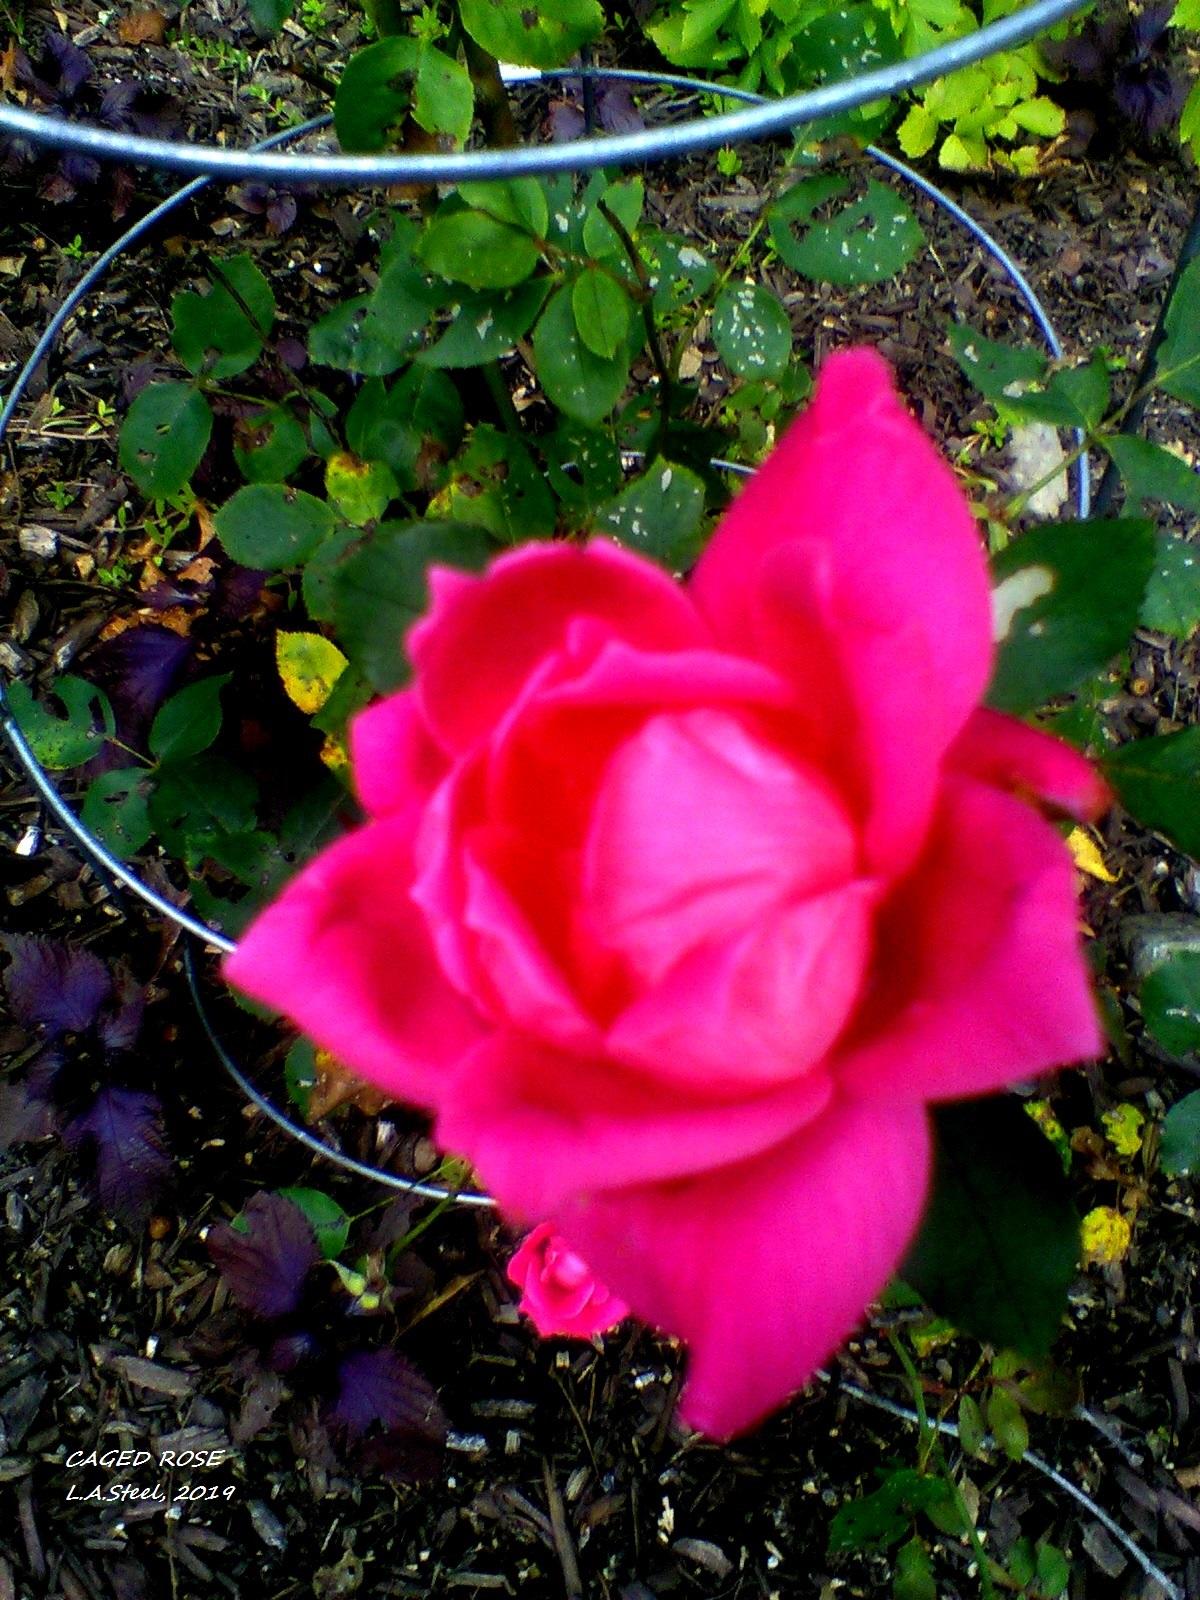 caged rose 1 2019